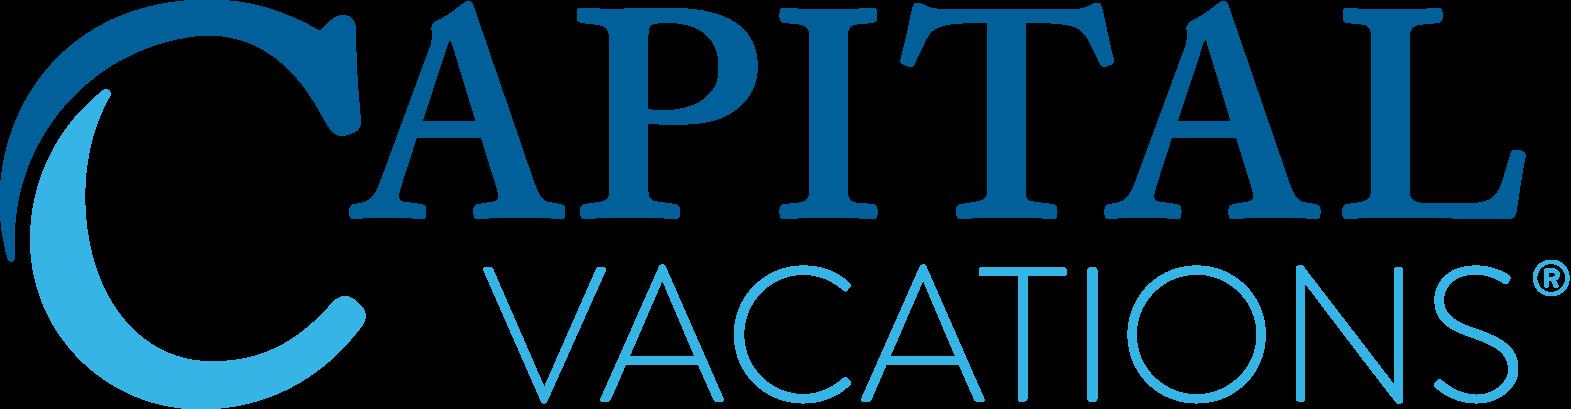 CapitalVacations_Logo-FullColor REGISTERED-2